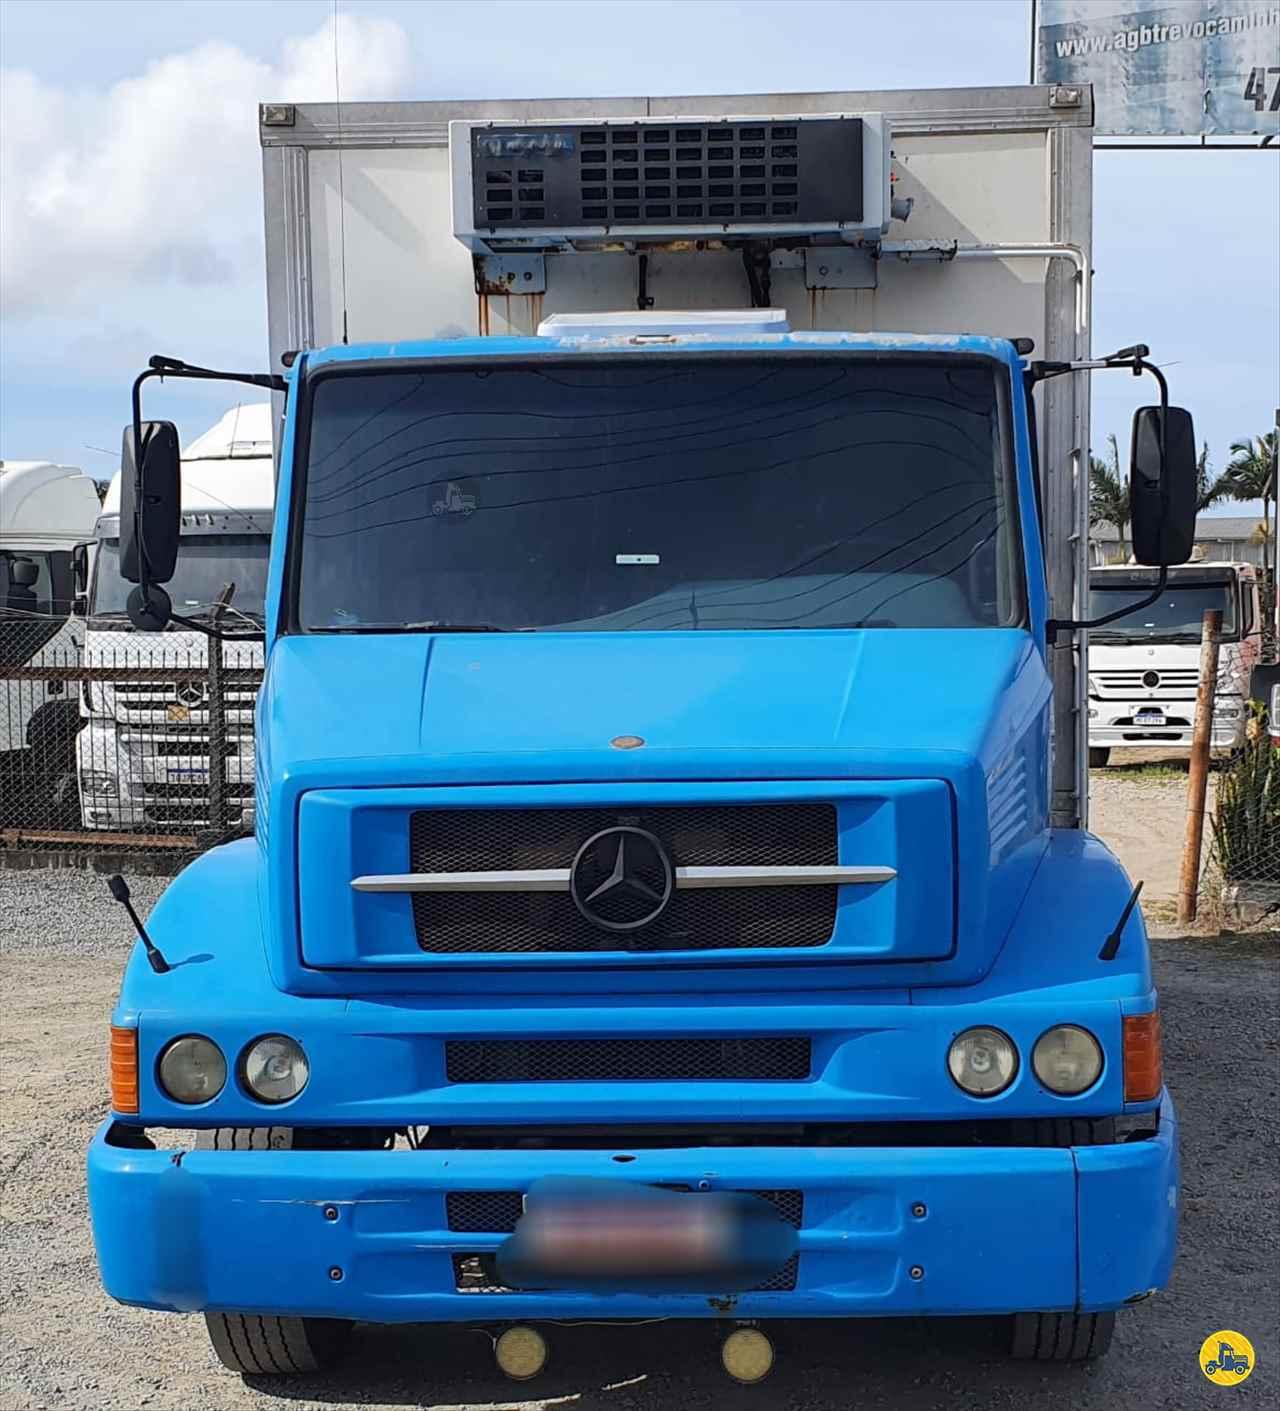 MB 1620 de Trevo Caminhões - AGB - ITAJAI/SC